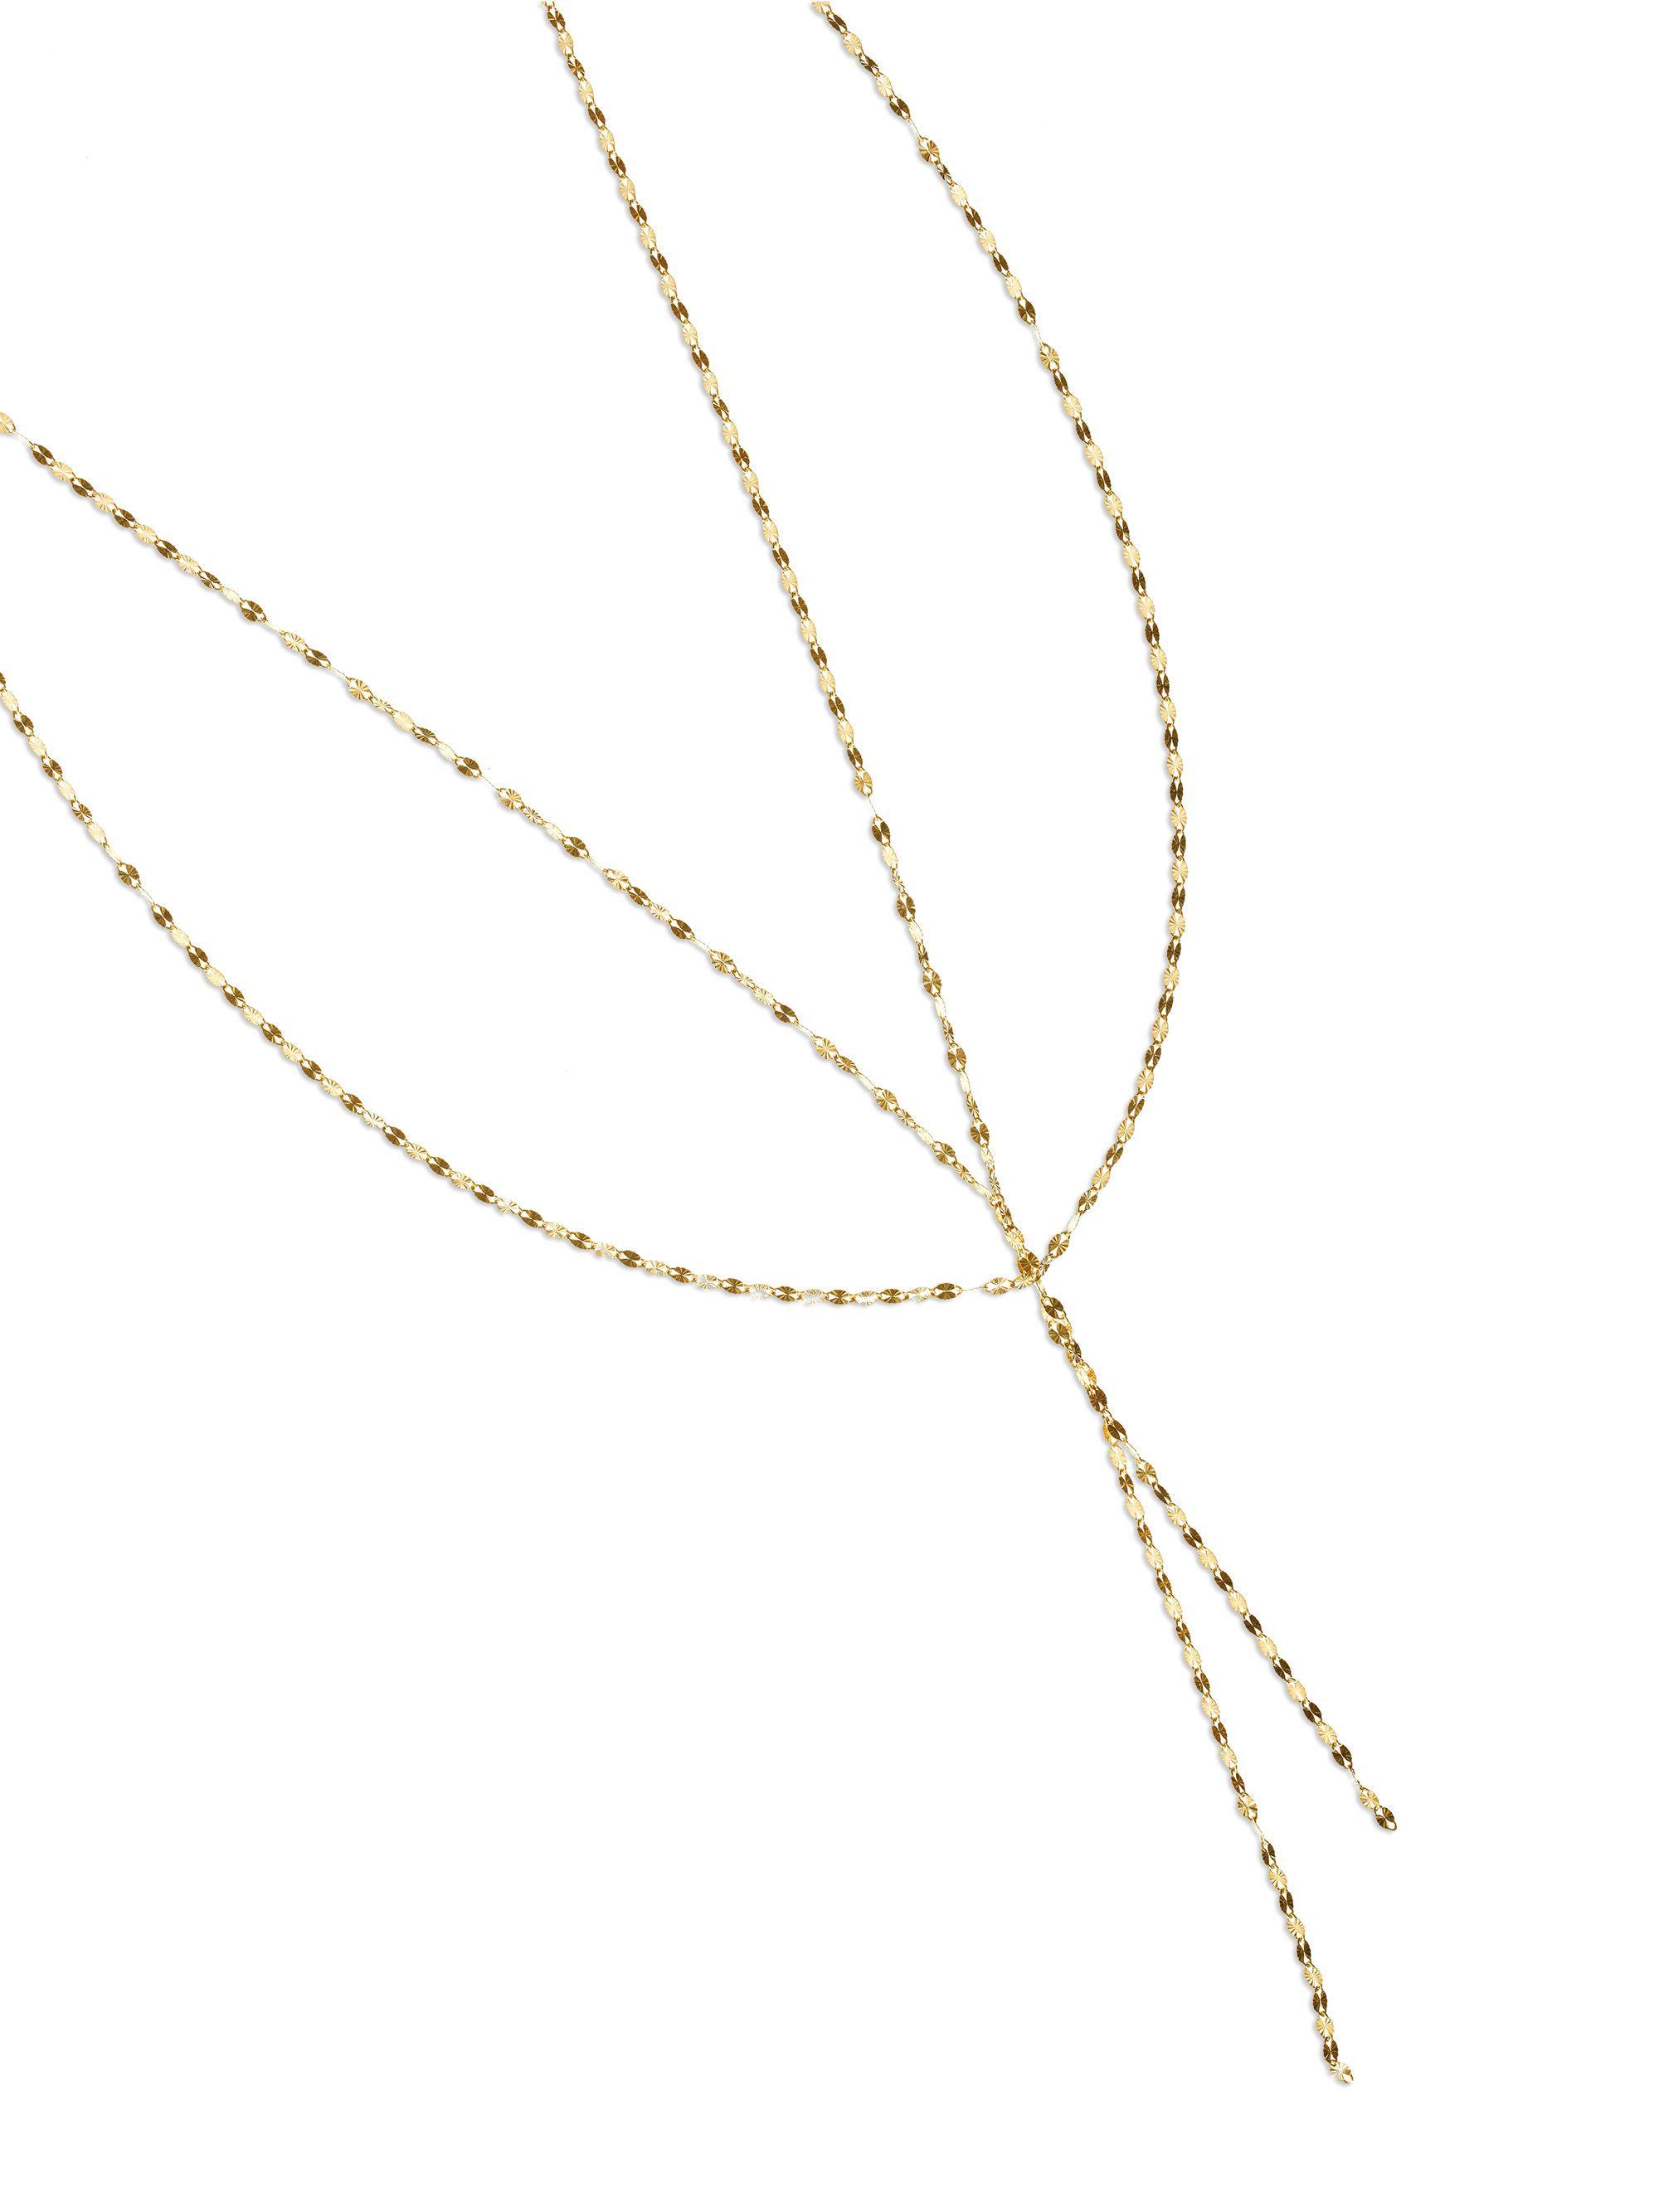 Lana Jewelry 14k Solo Blake Diamond Pendant Necklace 2tXr39